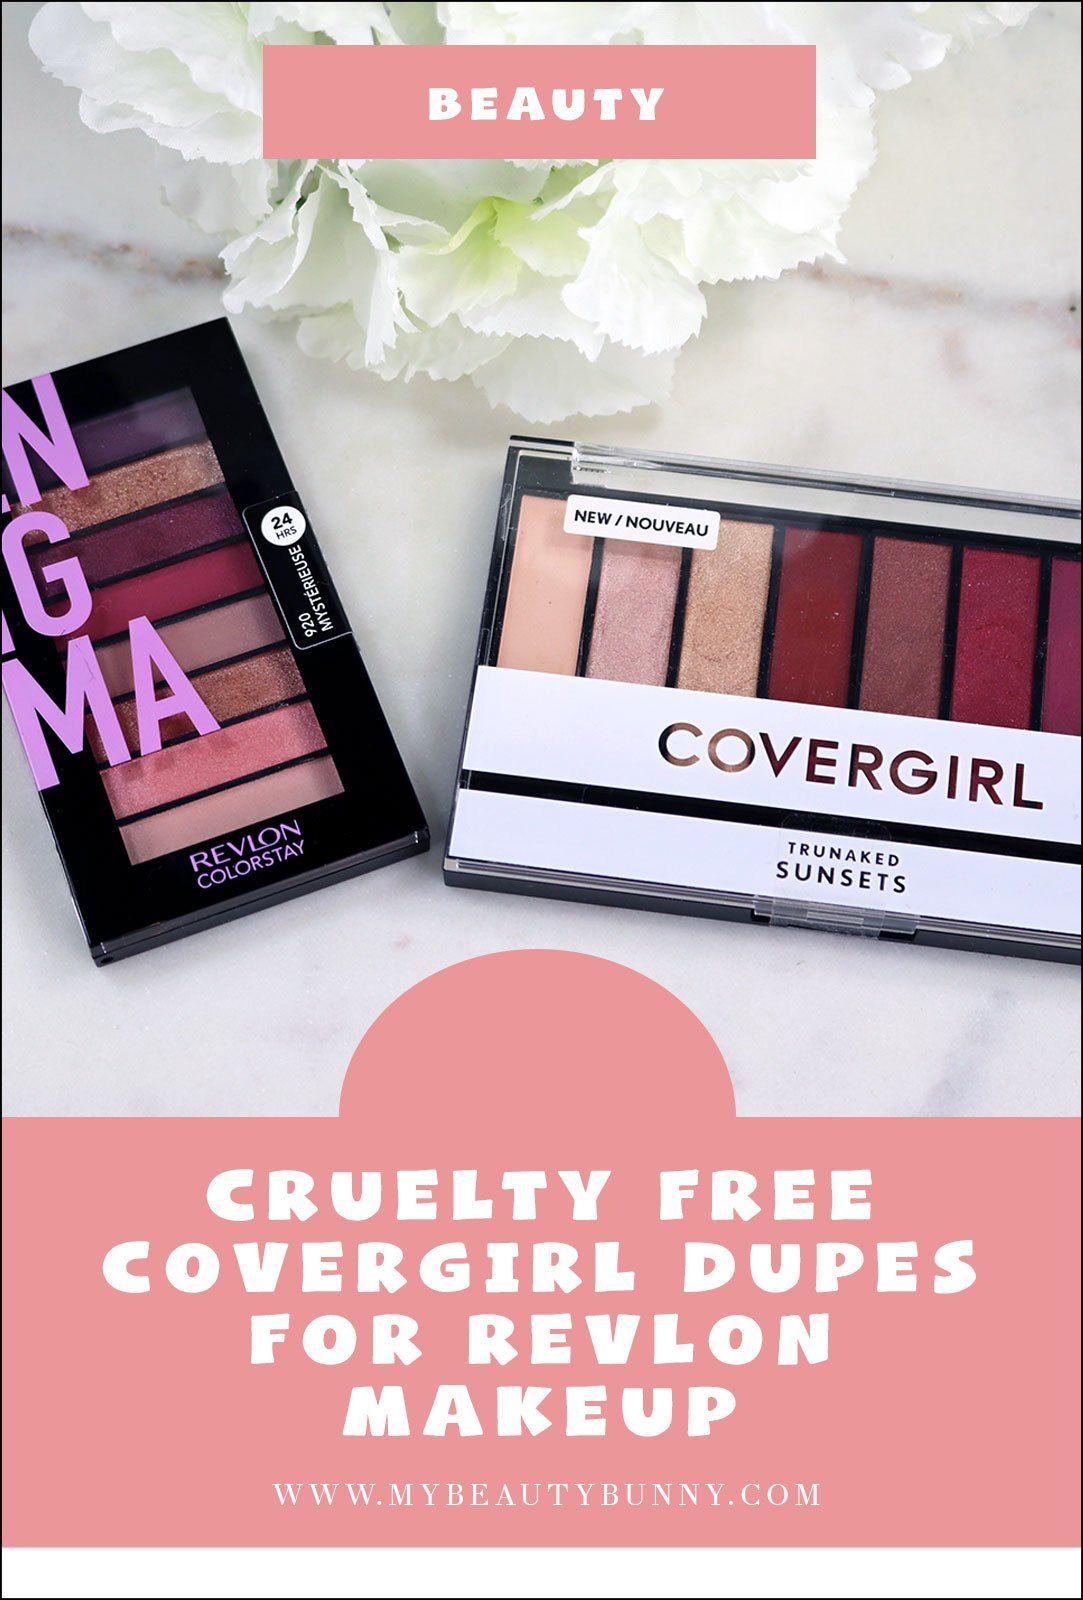 Cruelty Free Covergirl Dupes for Revlon Drugstore Makeup